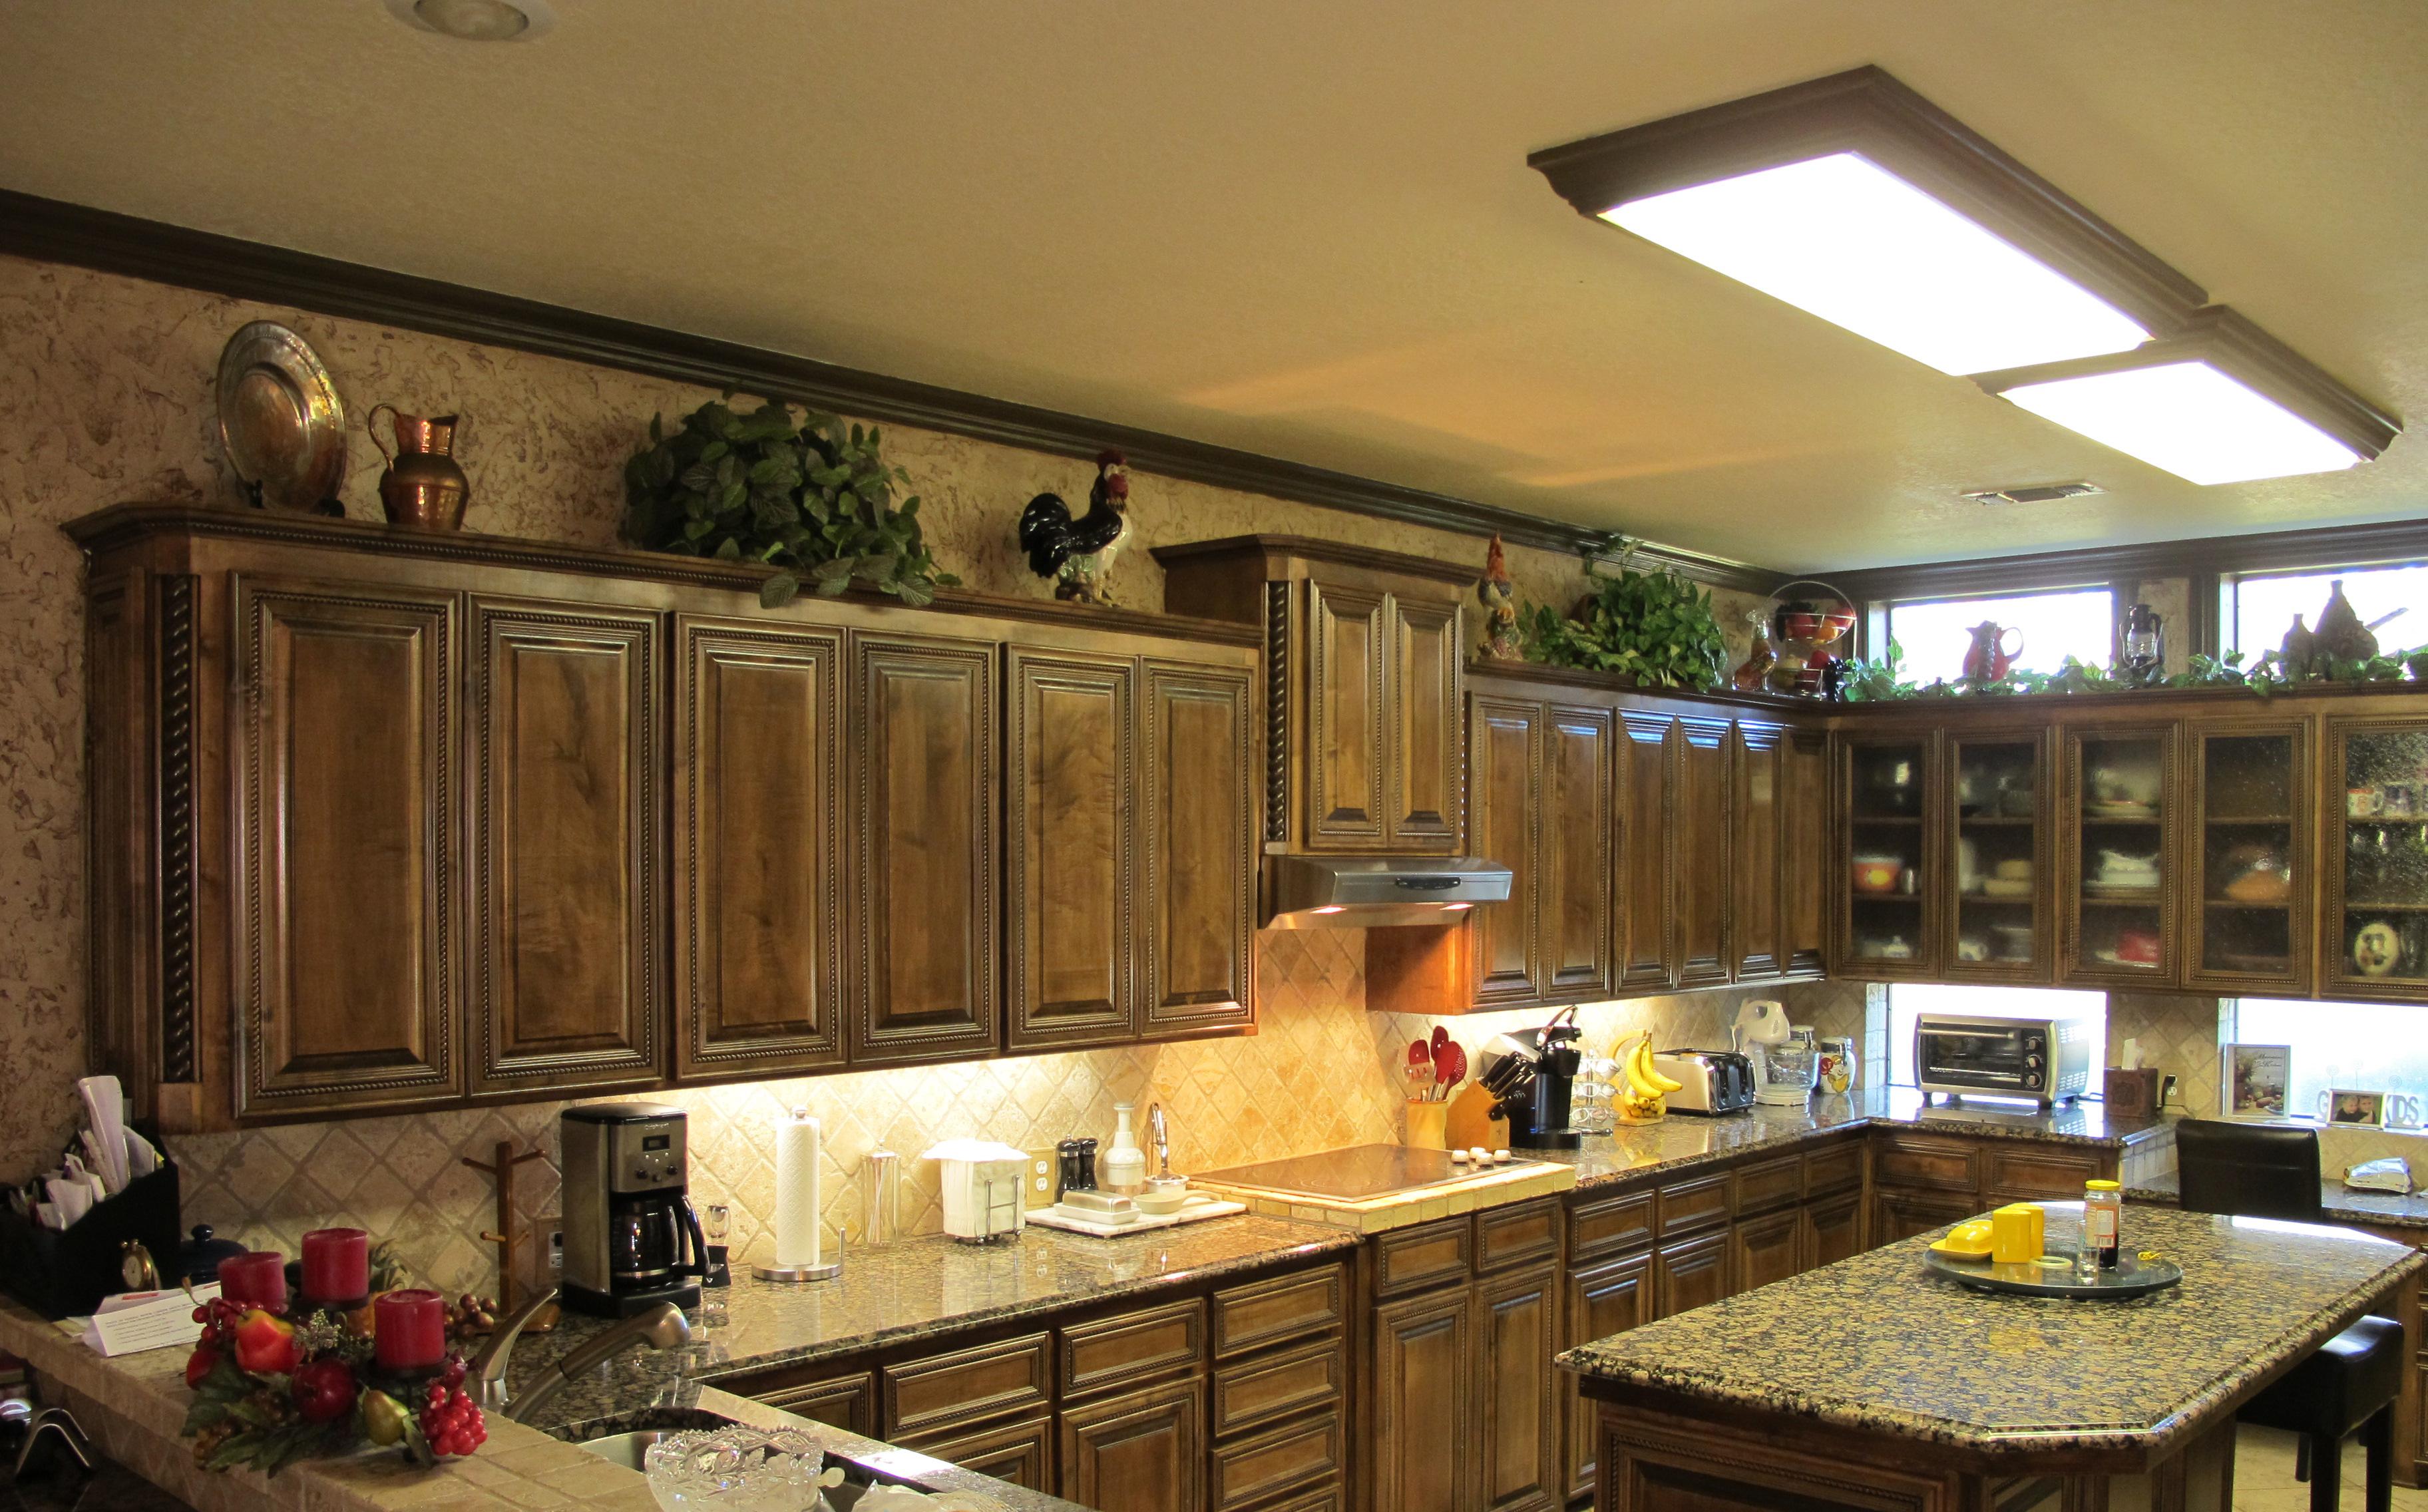 Kitchen Cabinets Remodeling Decorative Trim